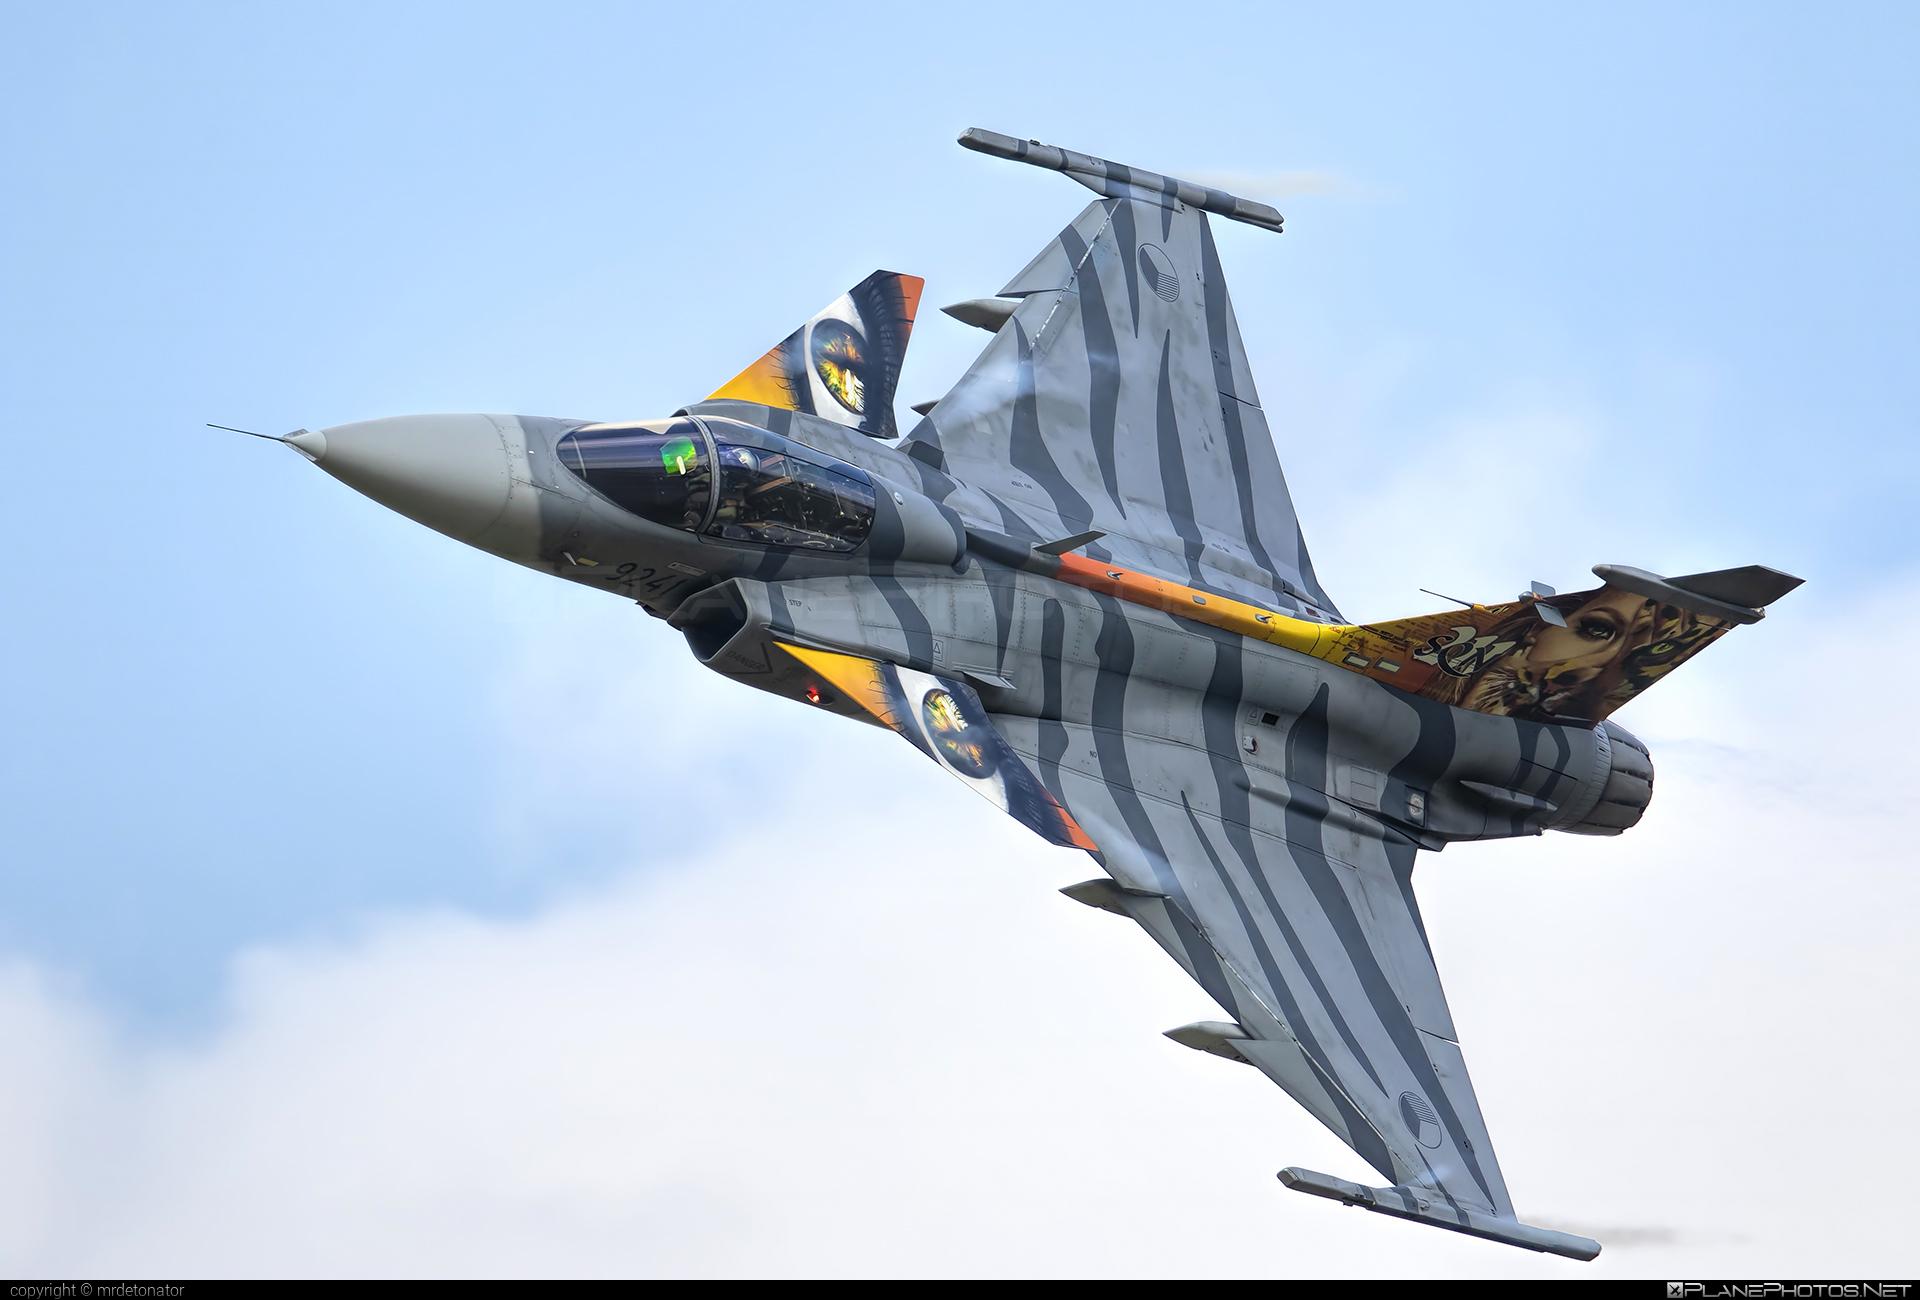 Saab JAS 39C Gripen - 9241 operated by Vzdušné síly AČR (Czech Air Force) #czechairforce #gripen #jas39 #jas39c #jas39gripen #natodays #natodays2018 #saab #vzdusnesilyacr